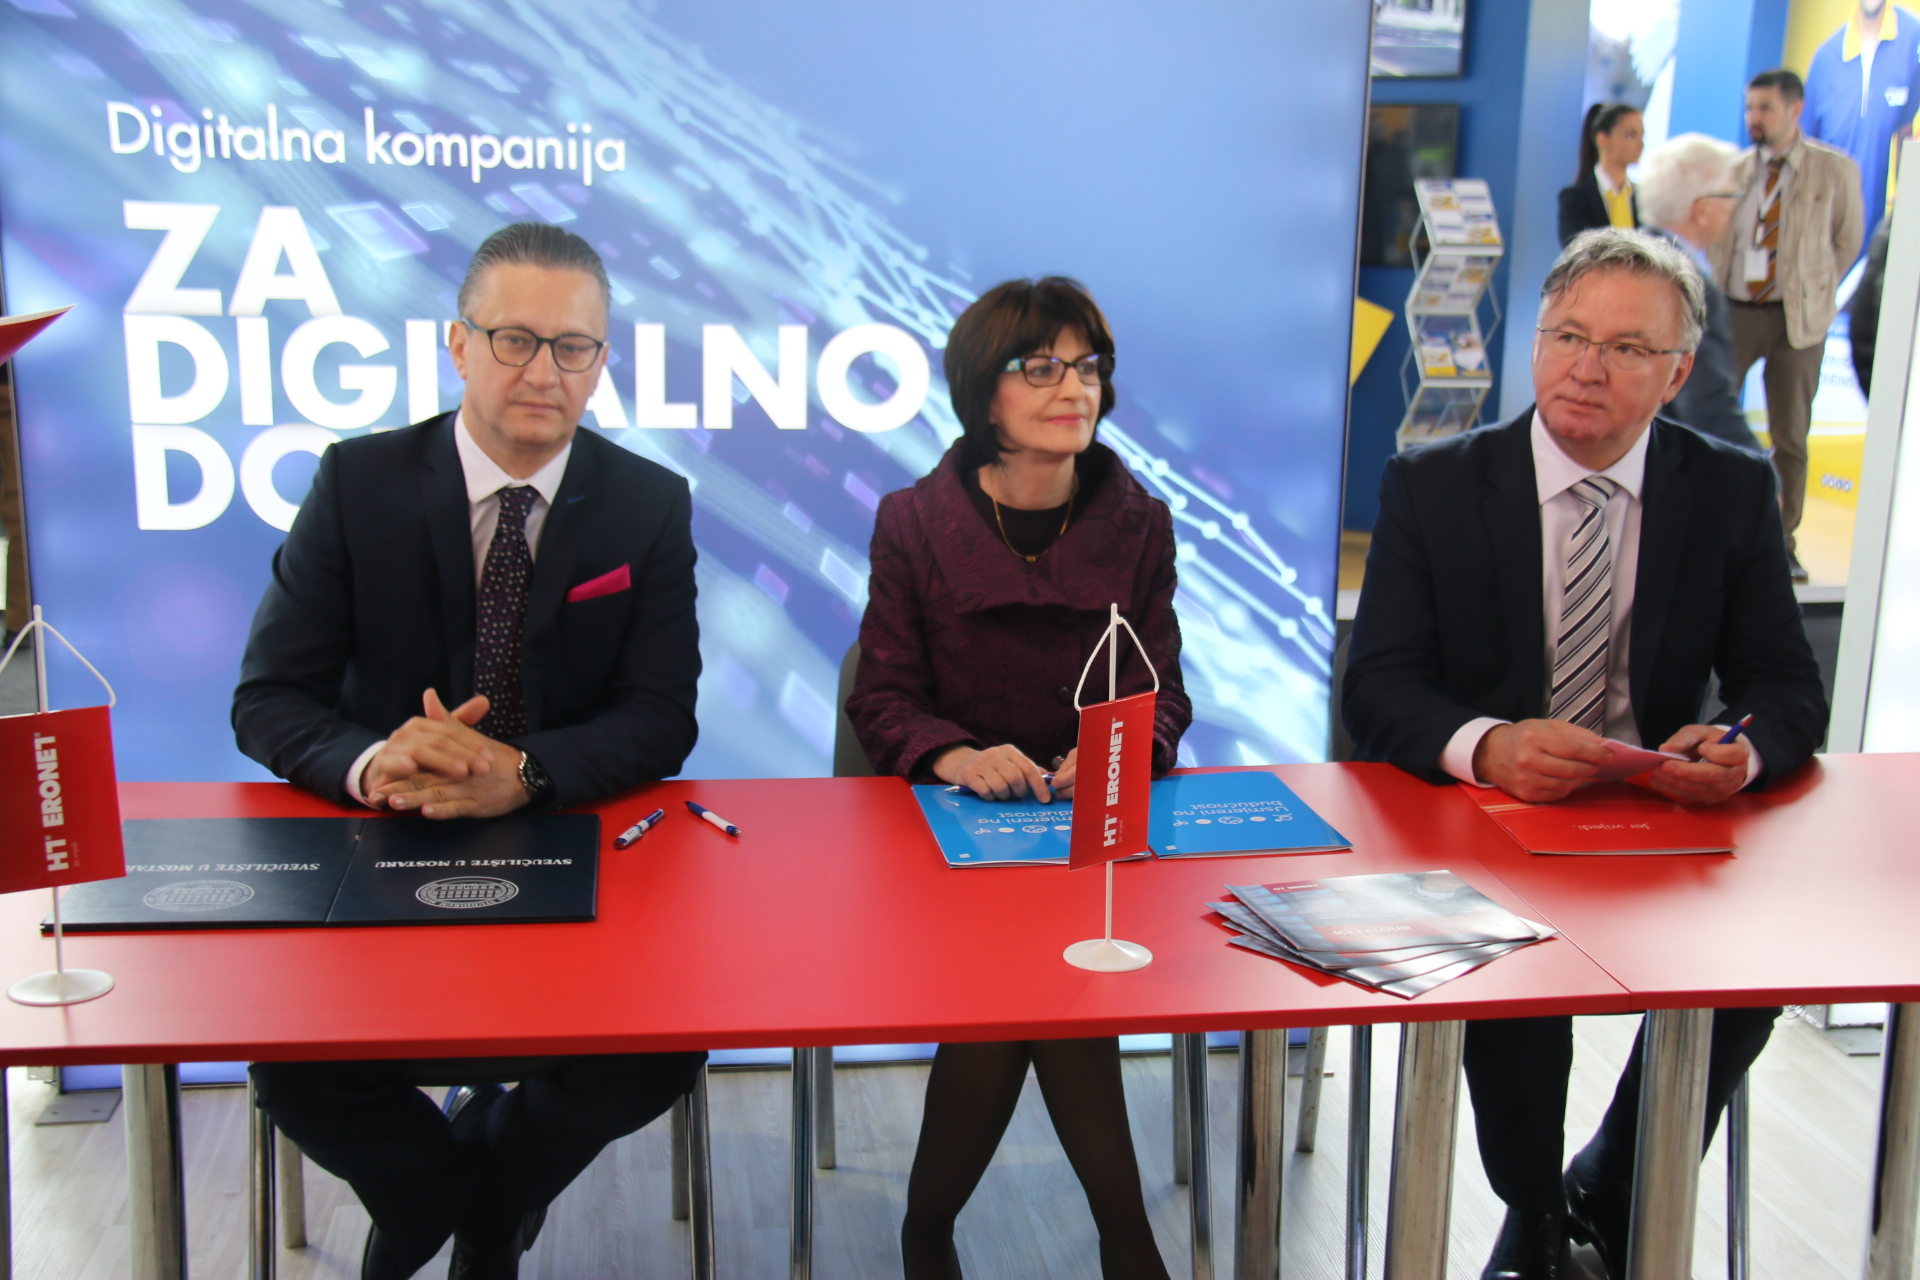 Potpisan sporazuma vodstva SUM-a, Ericssona Nikole Tesle i HT-a Mostara